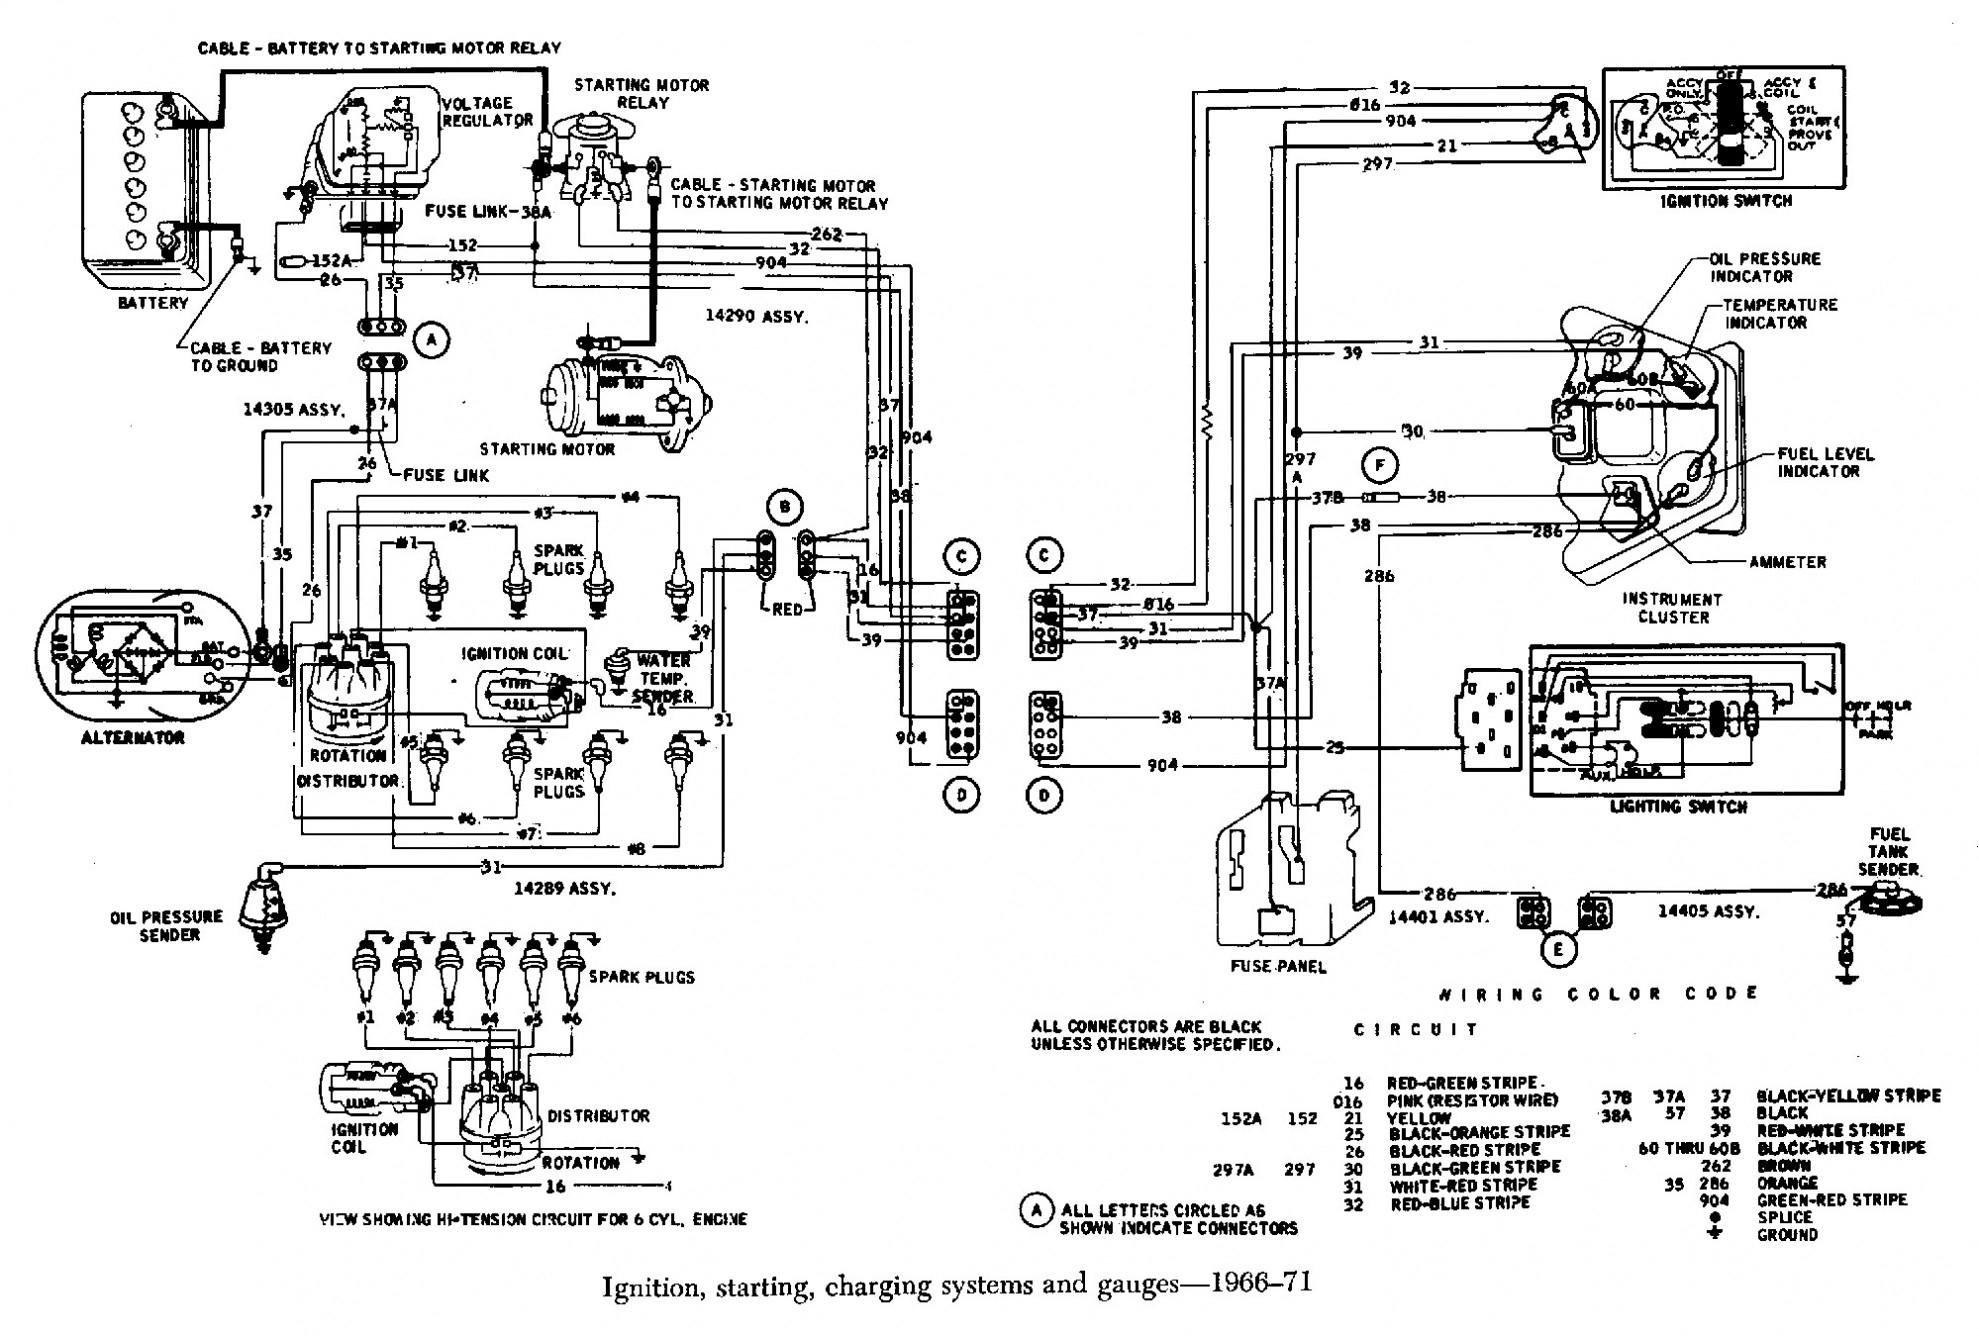 Plug Wiring Diagram Inspirational 50 Amp Twist Lock Plug Wiring - 50 Amp Twist Lock Plug Wiring Diagram